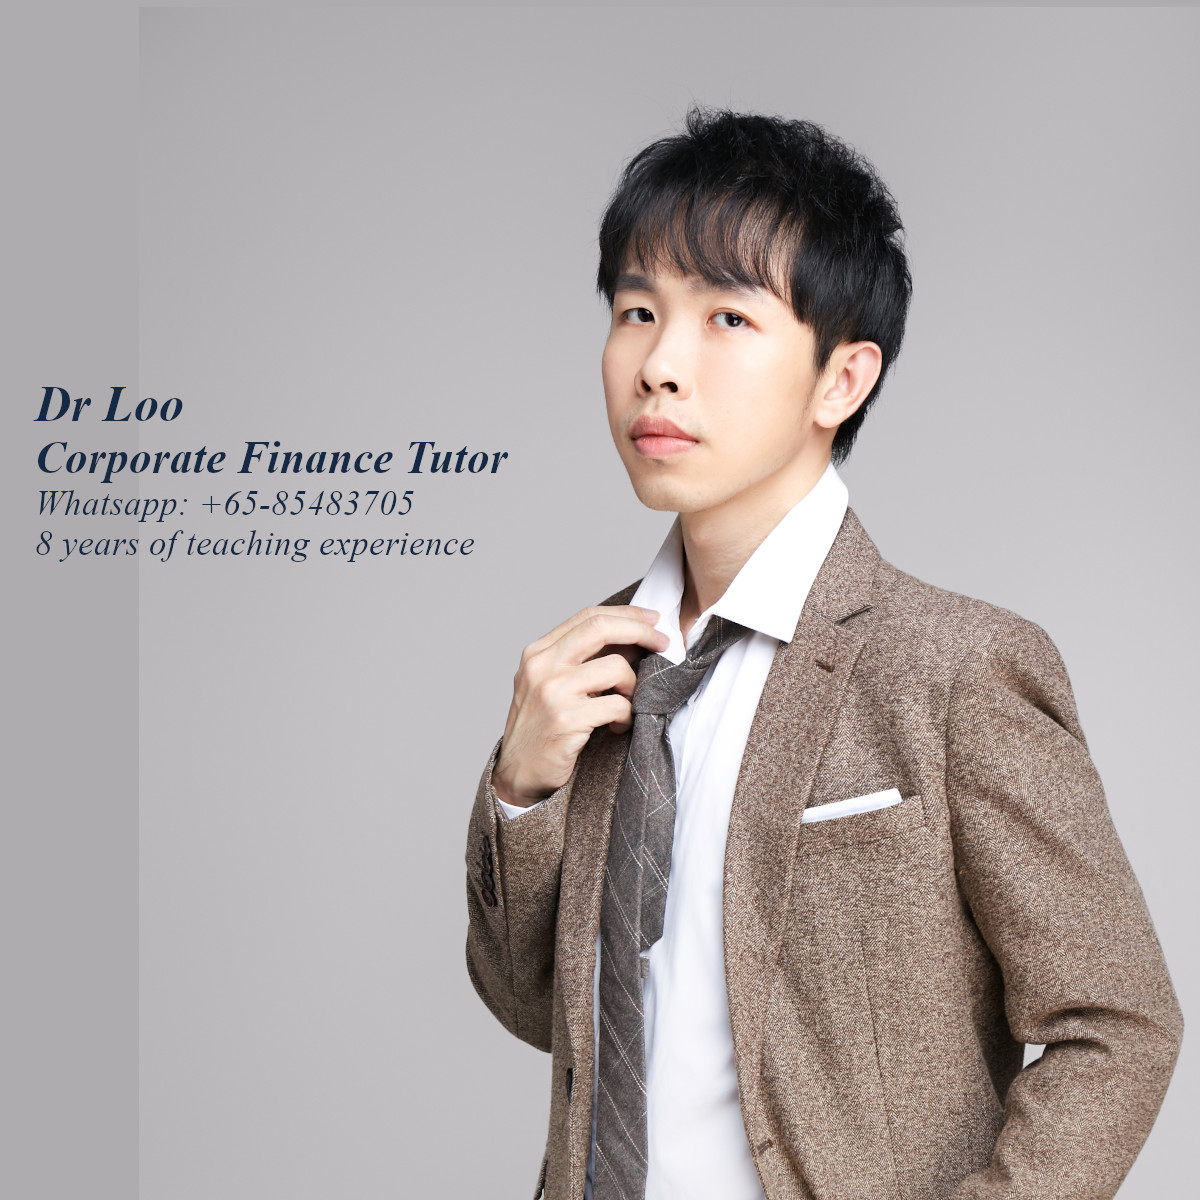 Corporate Finance Tutor in Singapore